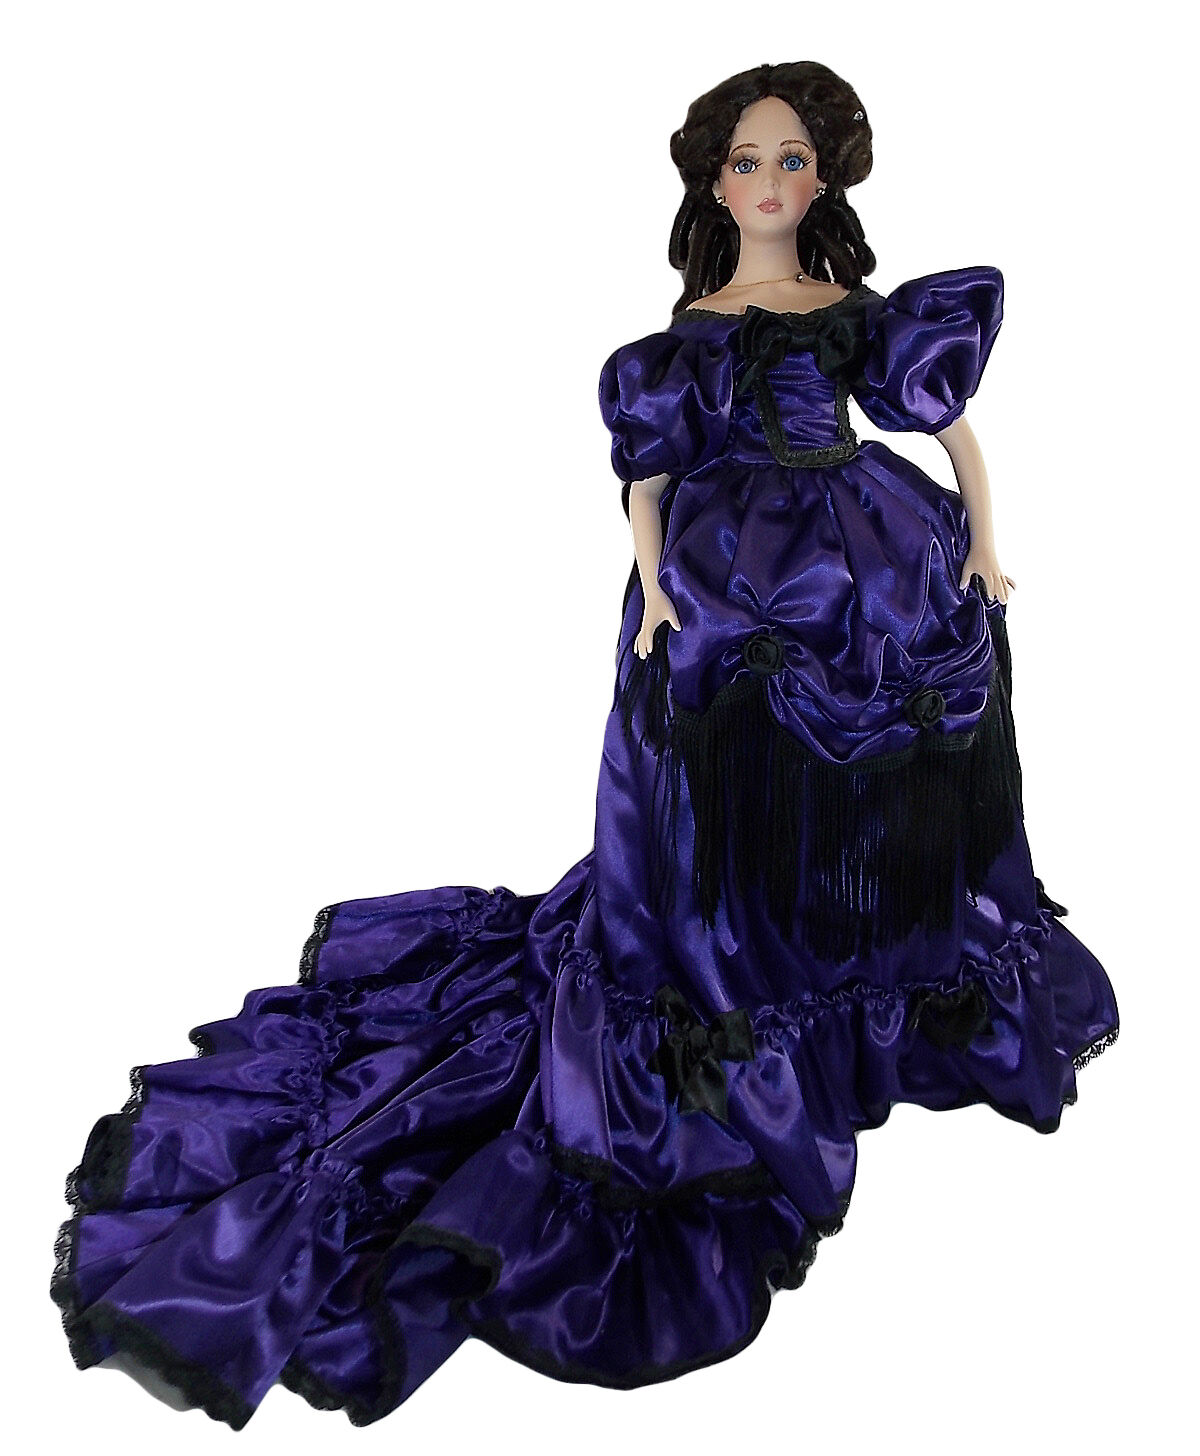 SEYMOUR MANN CARLOTIA PORCELAIN 22  DOLL Collectible púrpura Dress marróne Hair